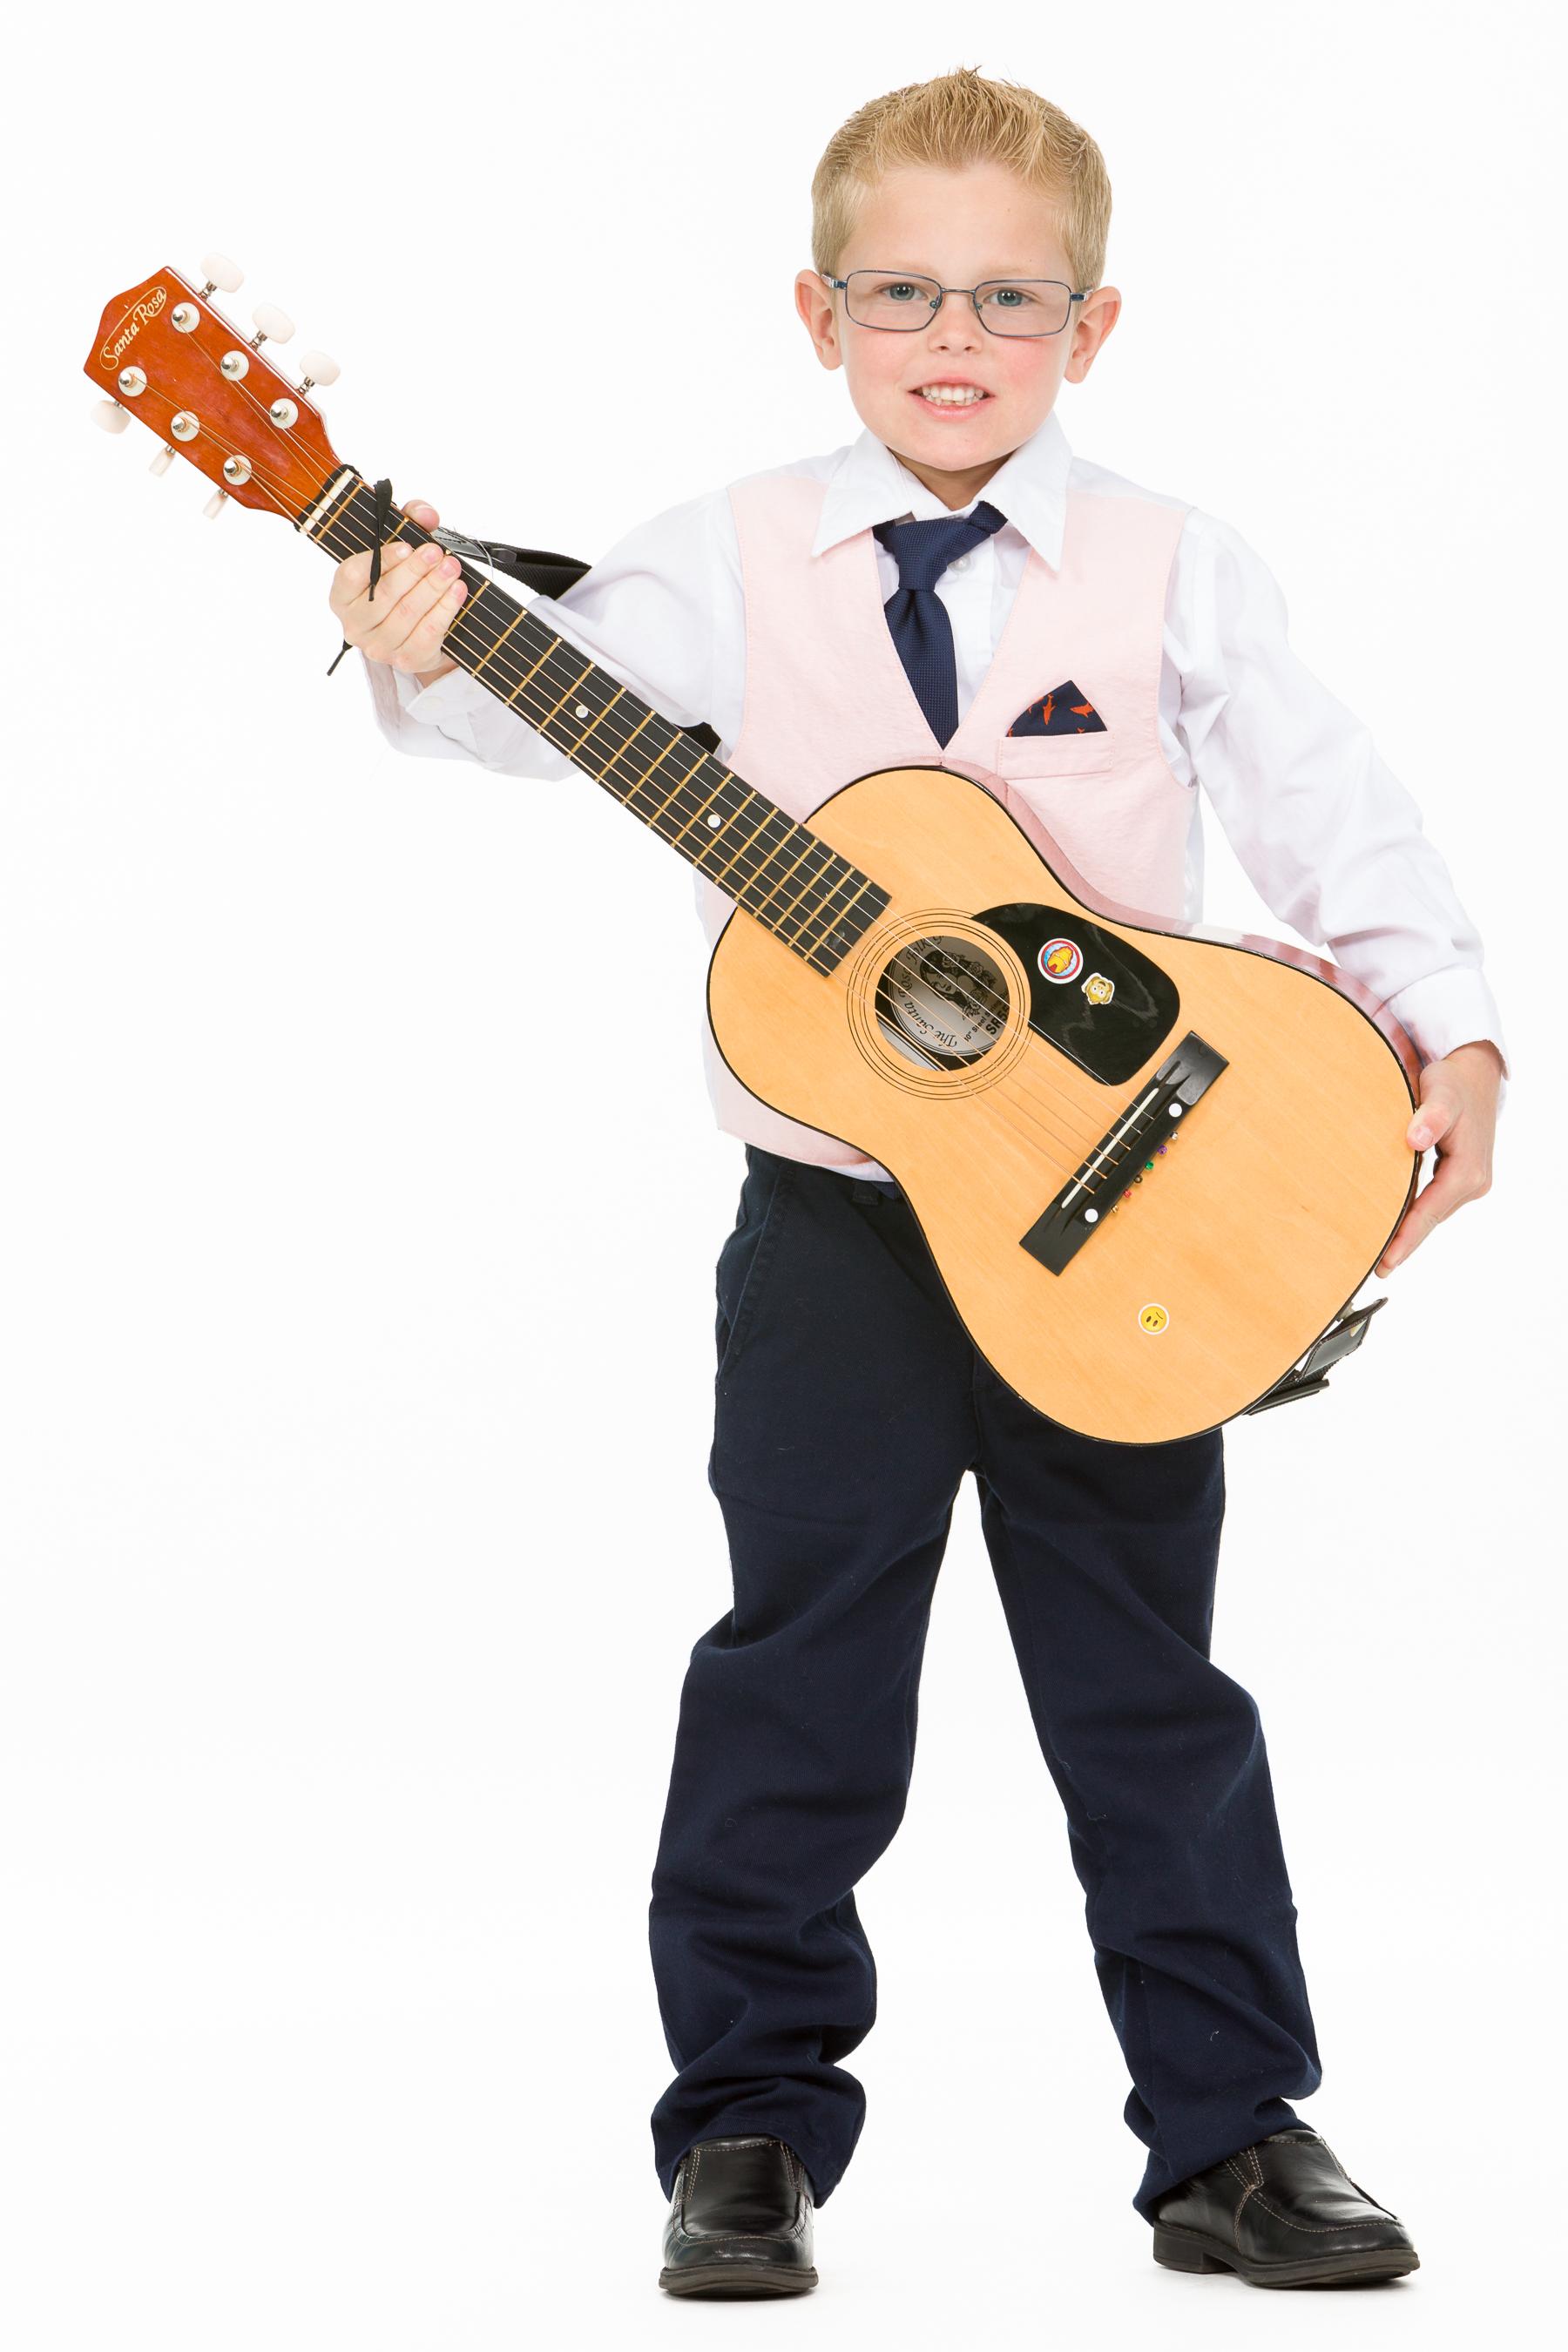 Guitar - Music Students__5DIV7210-1.jpg